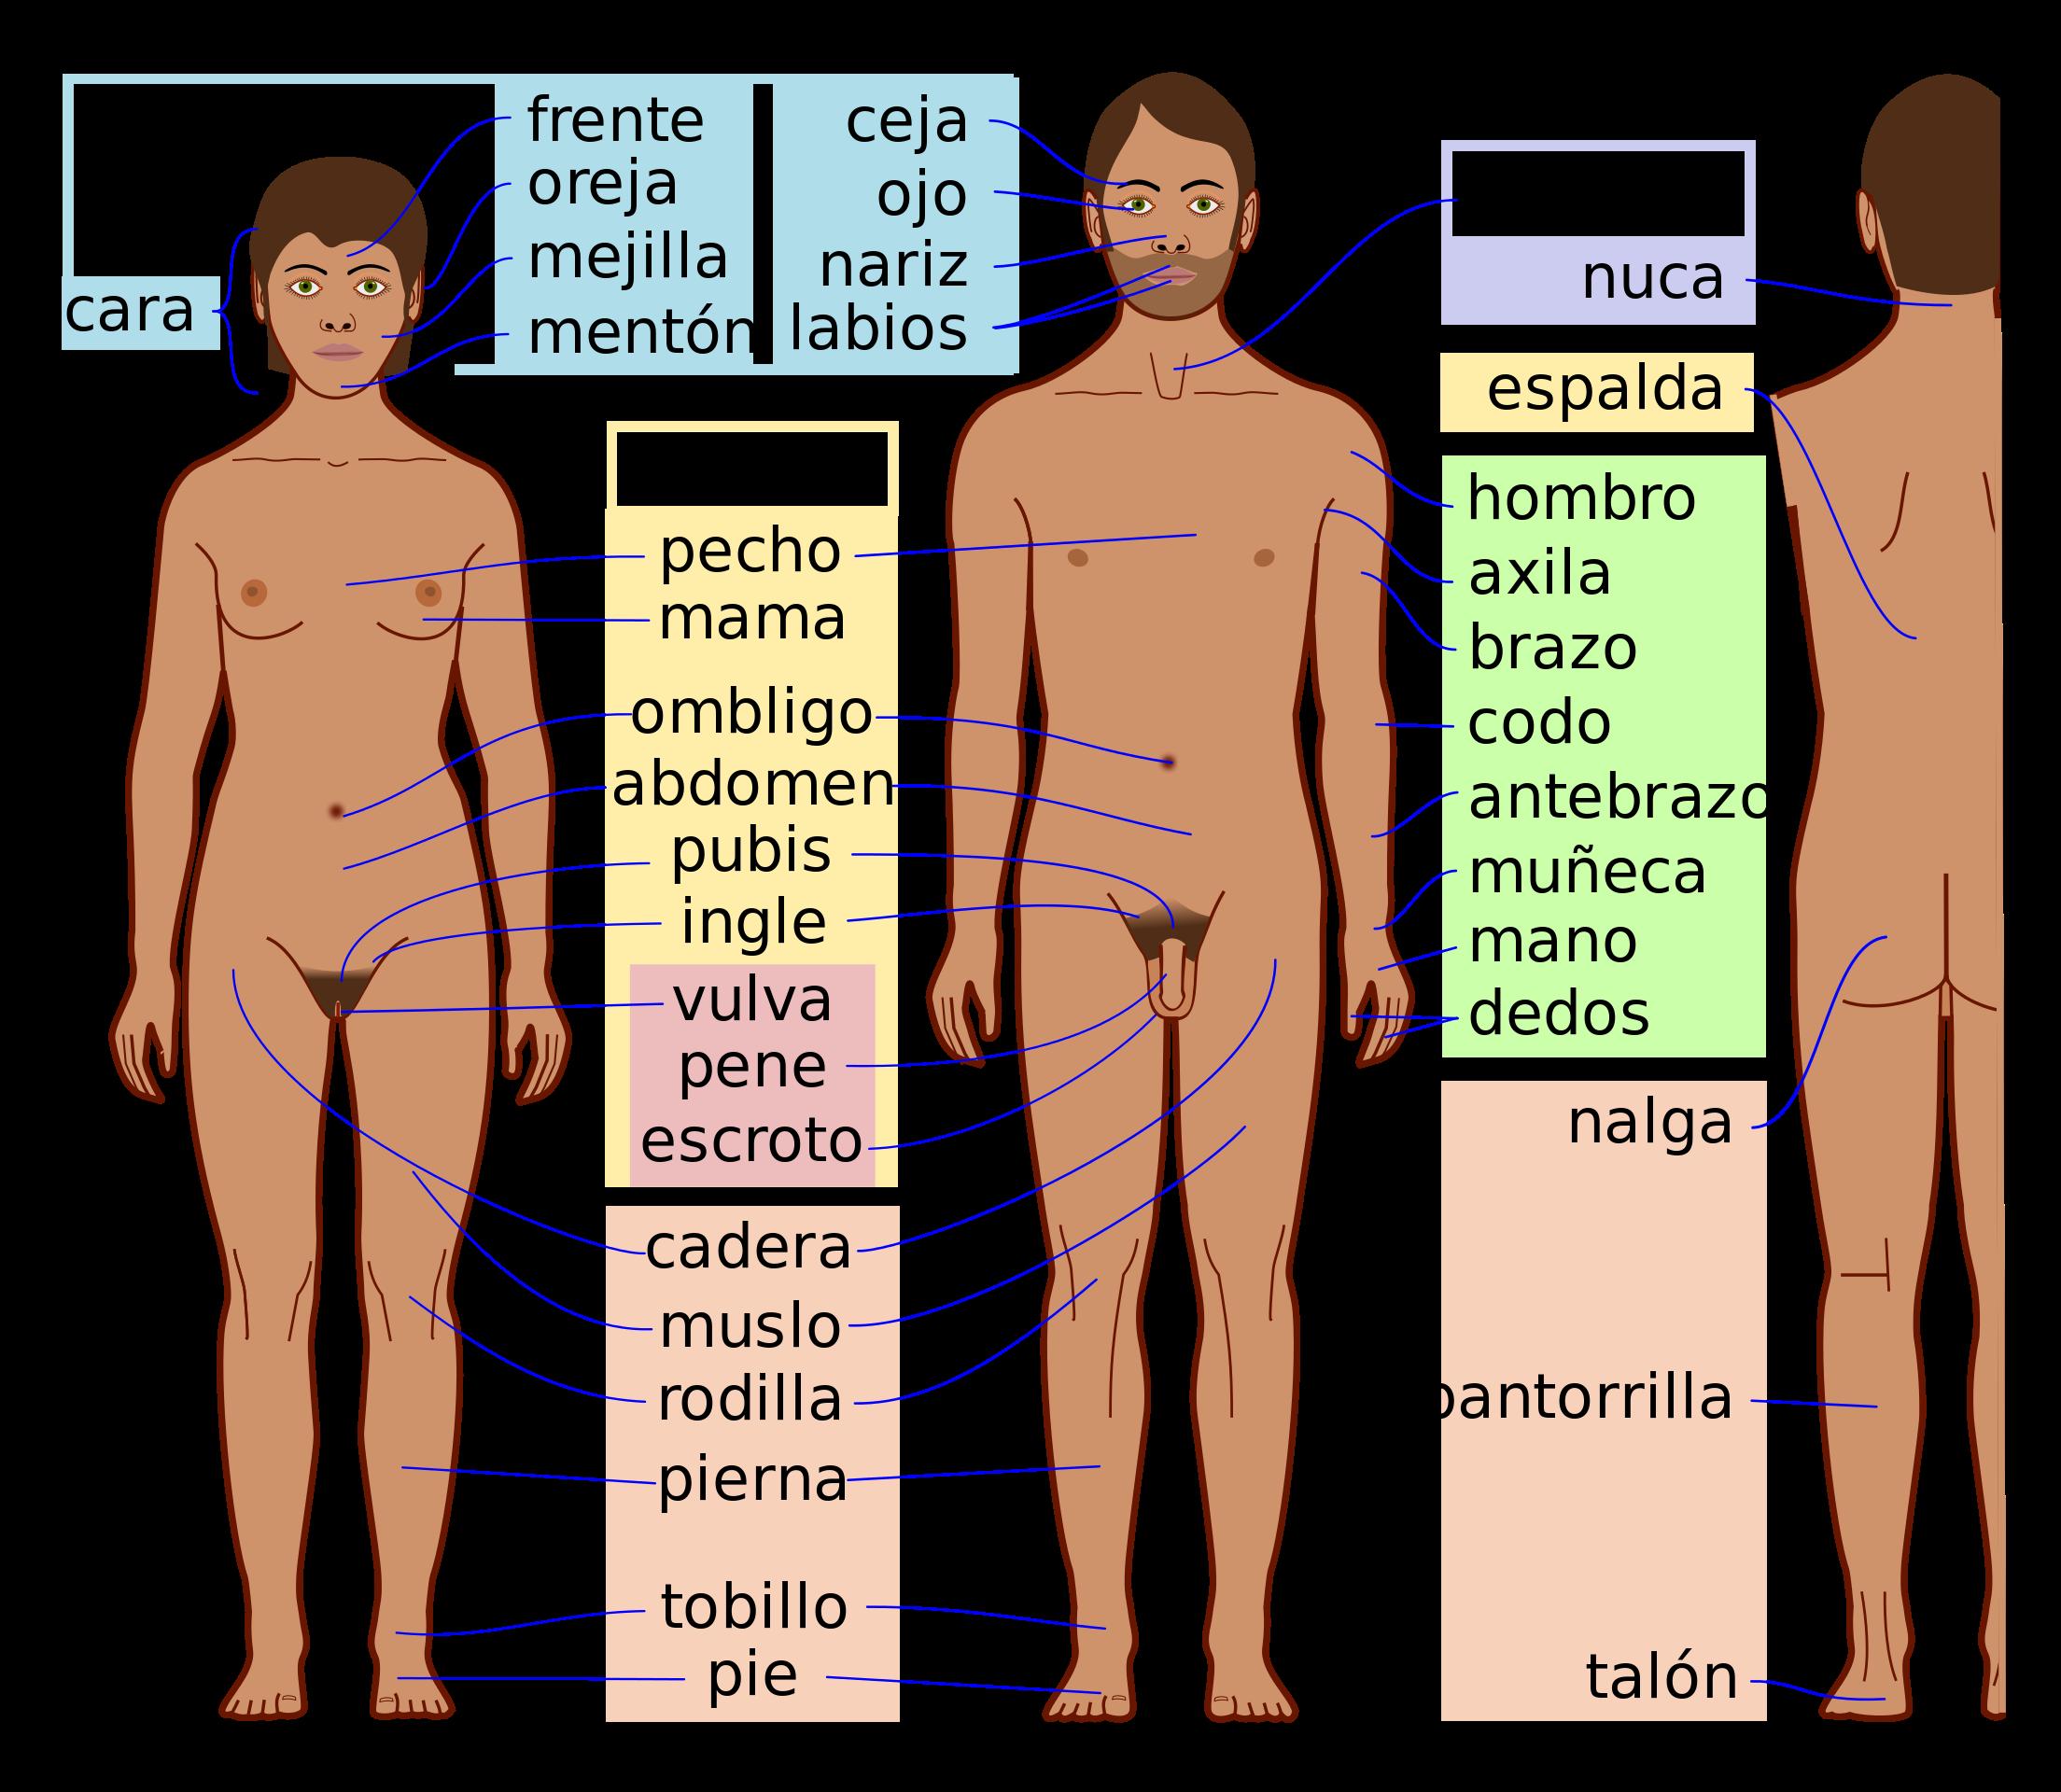 Cuerpo humano - Wikipedia, la enciclopedia libre | Aprender | Pinterest